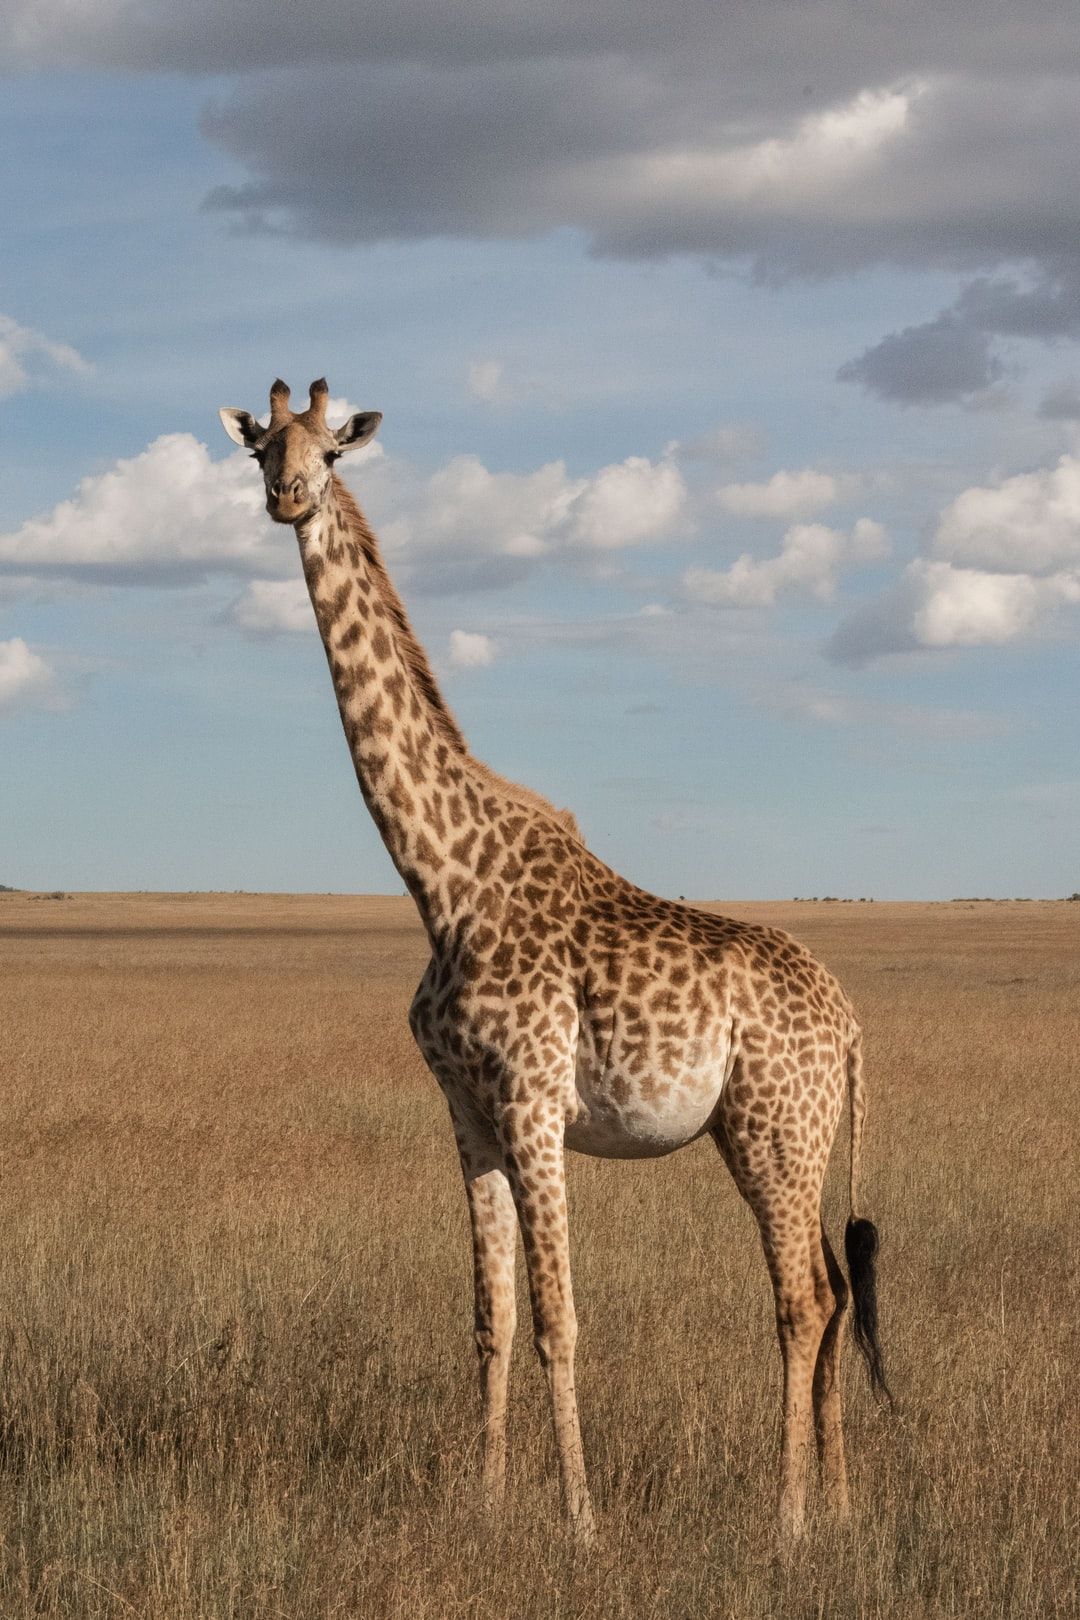 Giraffe during safari in Maasai Mara National Park in Kenya, Africa.